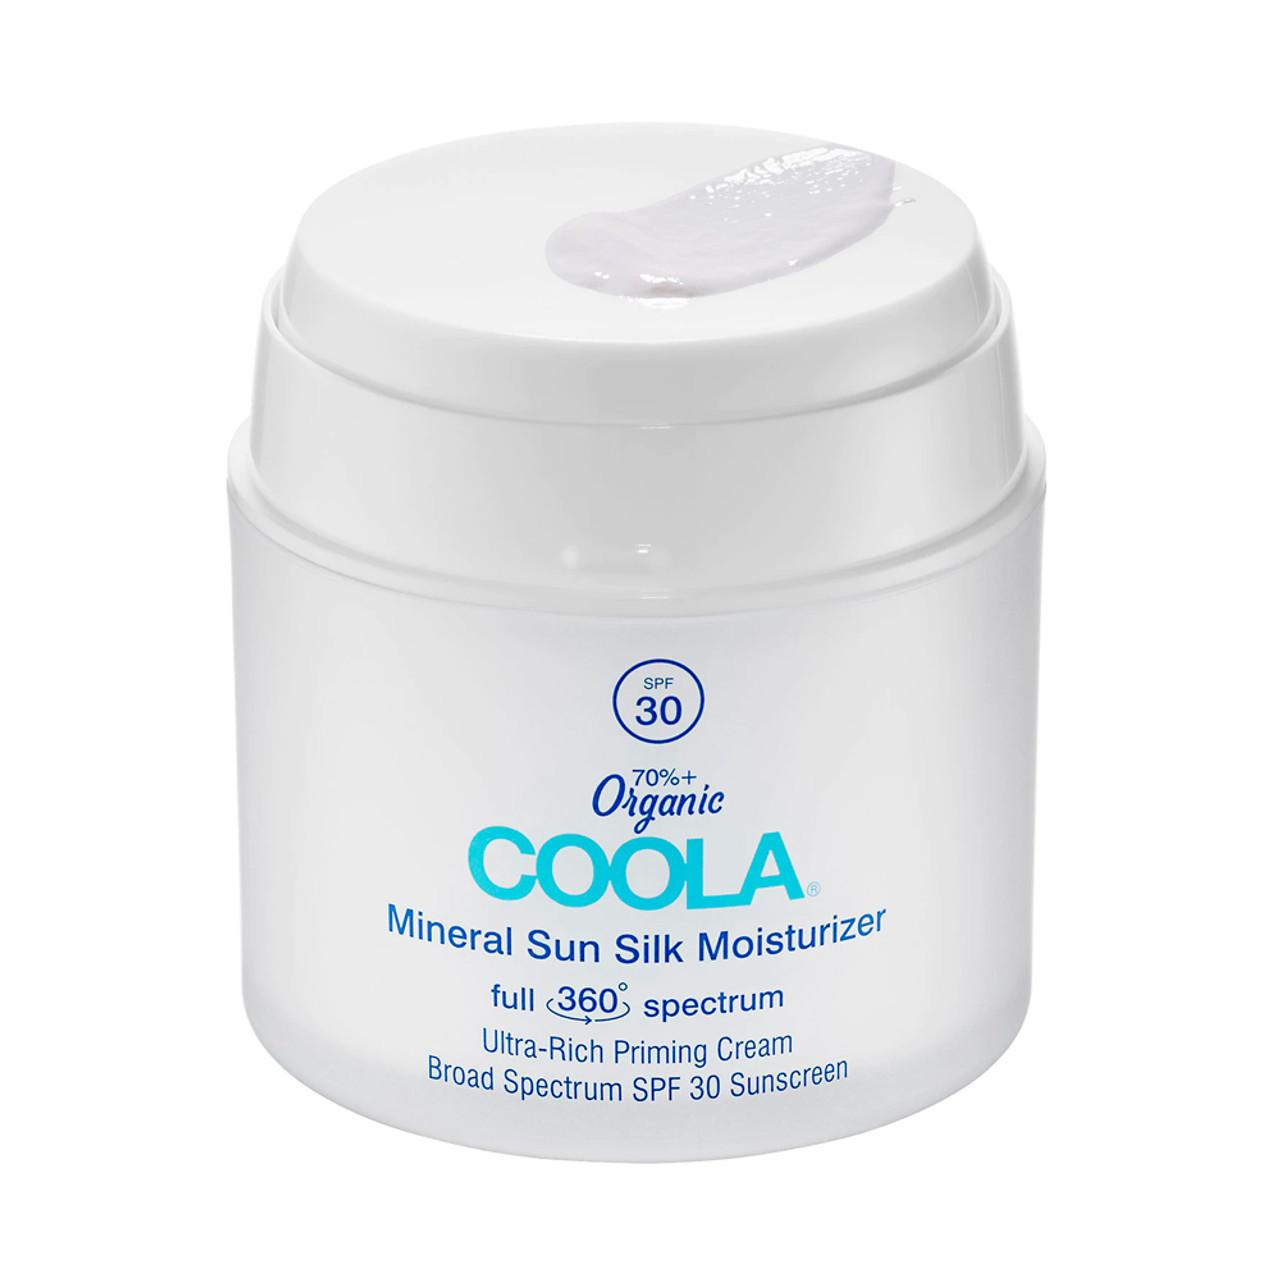 Coola Full Spectrum 360° Mineral Sun Silk Moisturizer Organic Sunscreen SPF 30